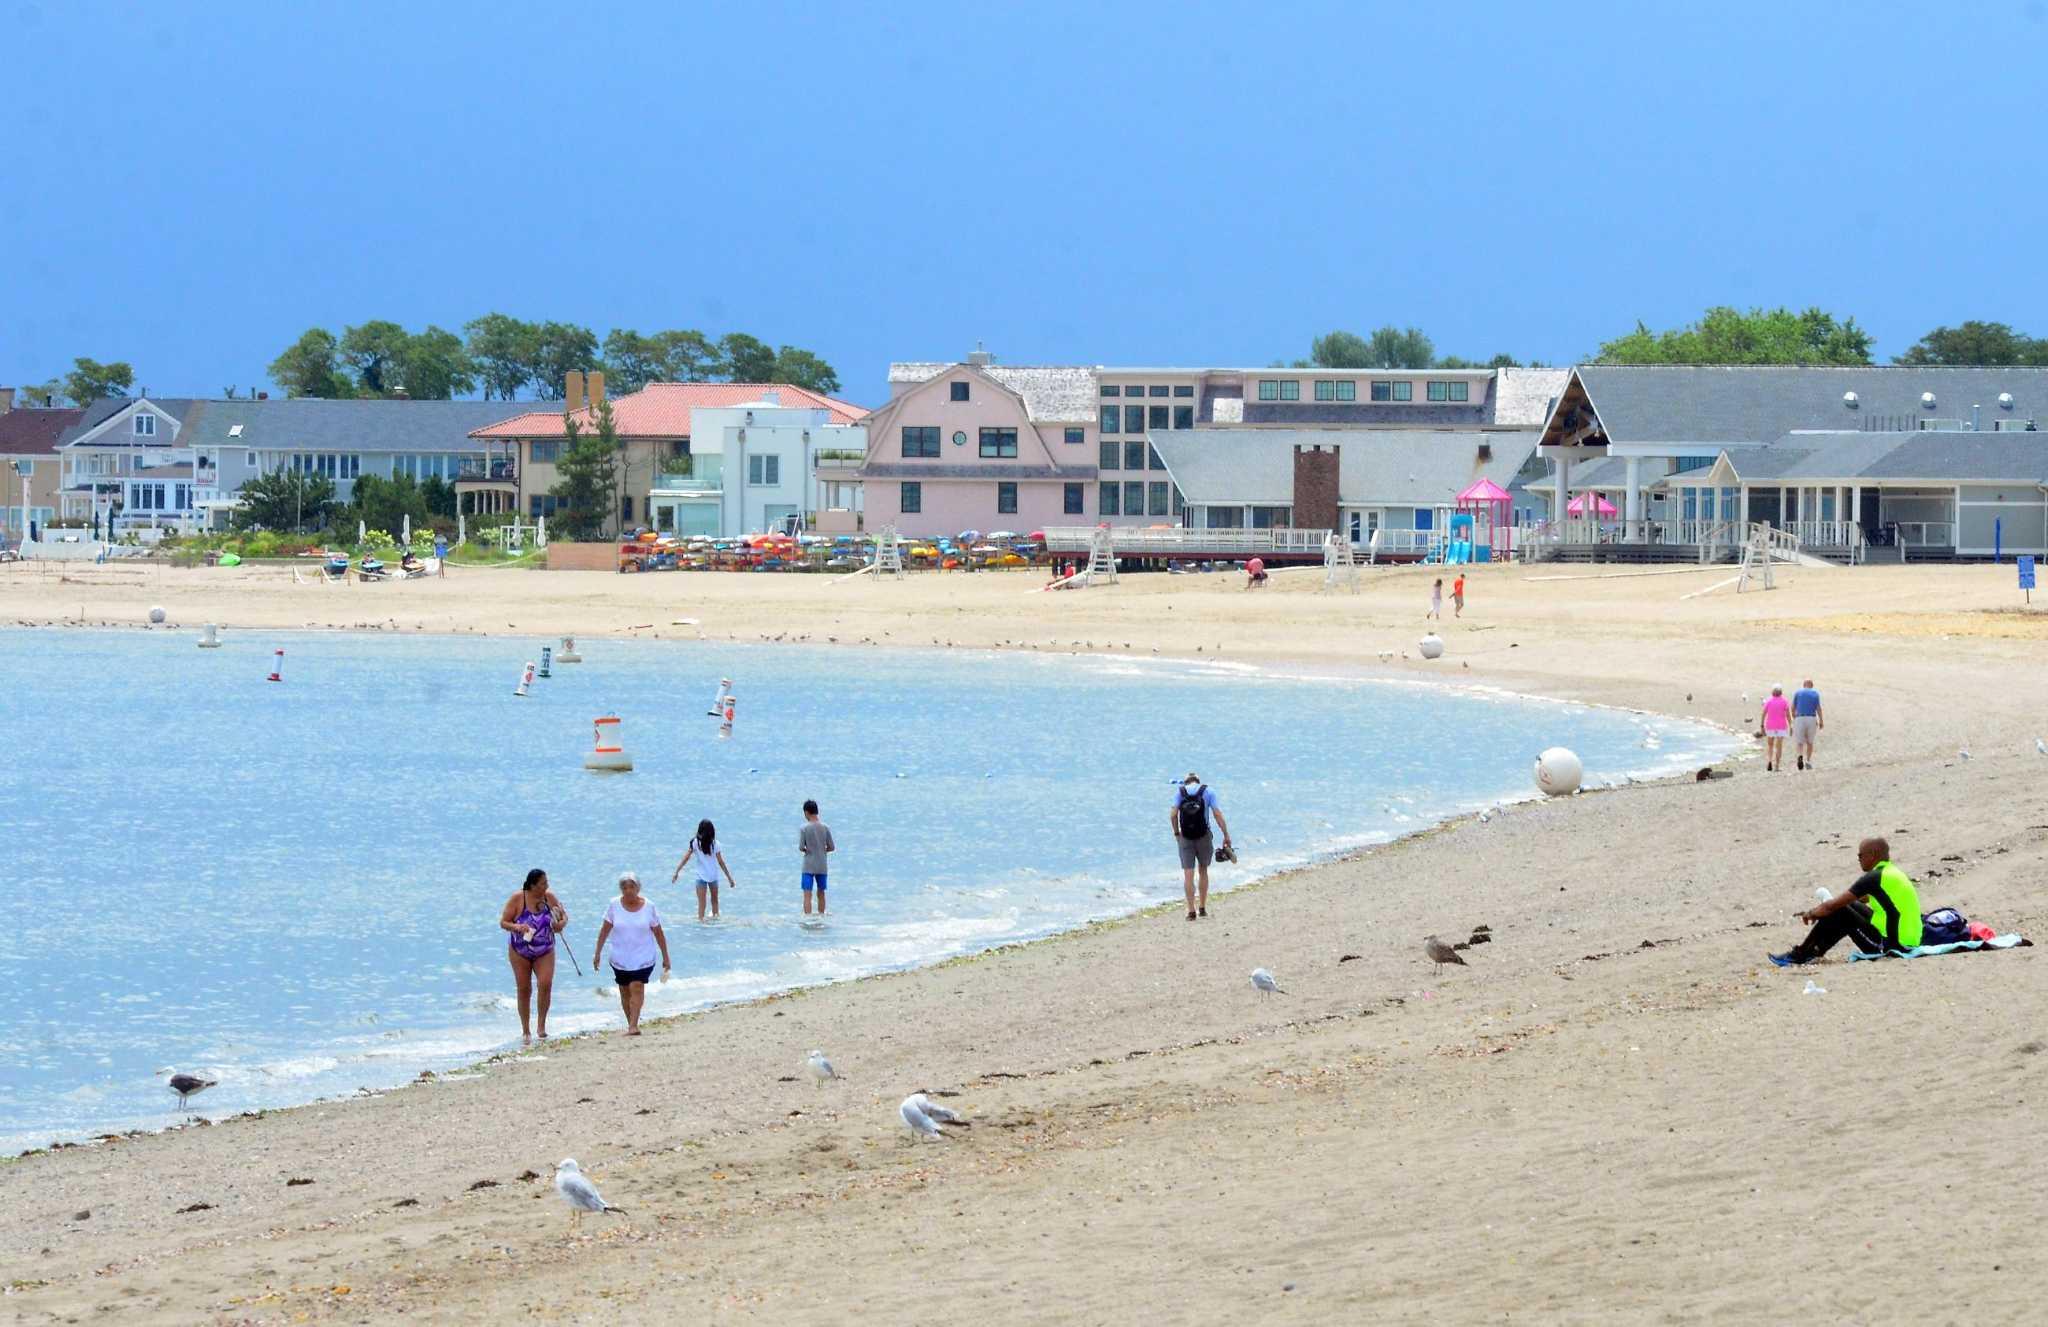 Beach Season May Include Higher Fees